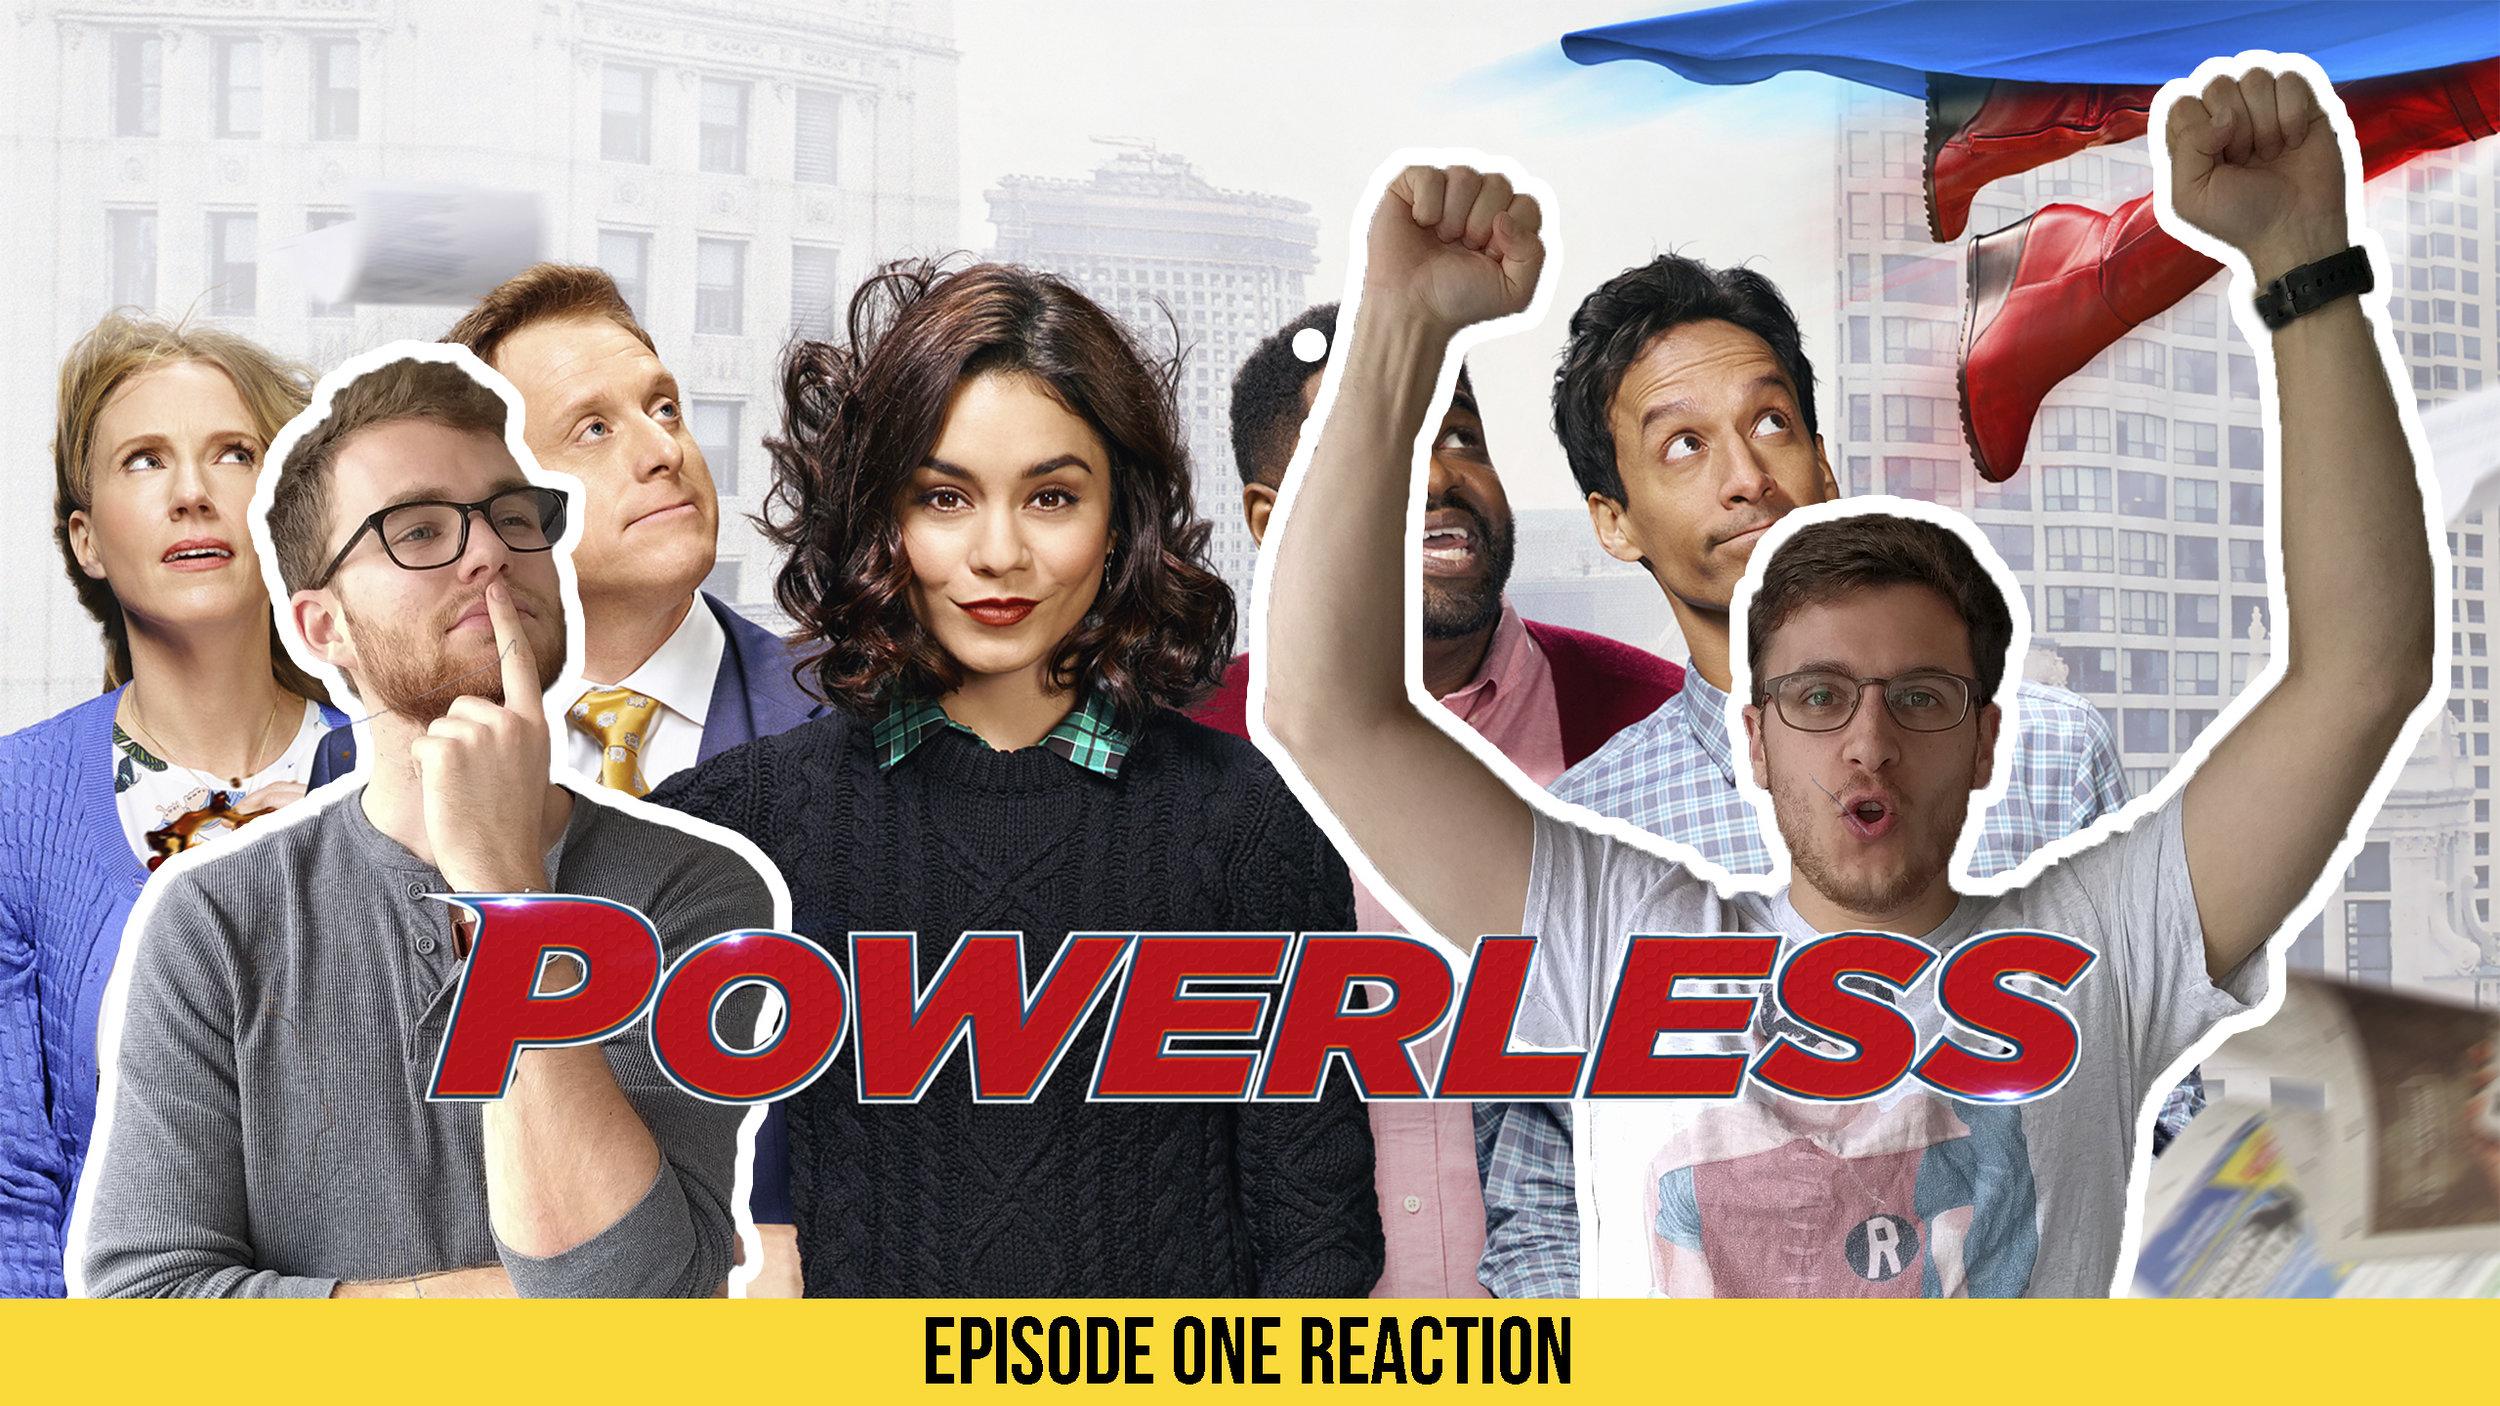 CCWG powerless Thumbnail.jpg